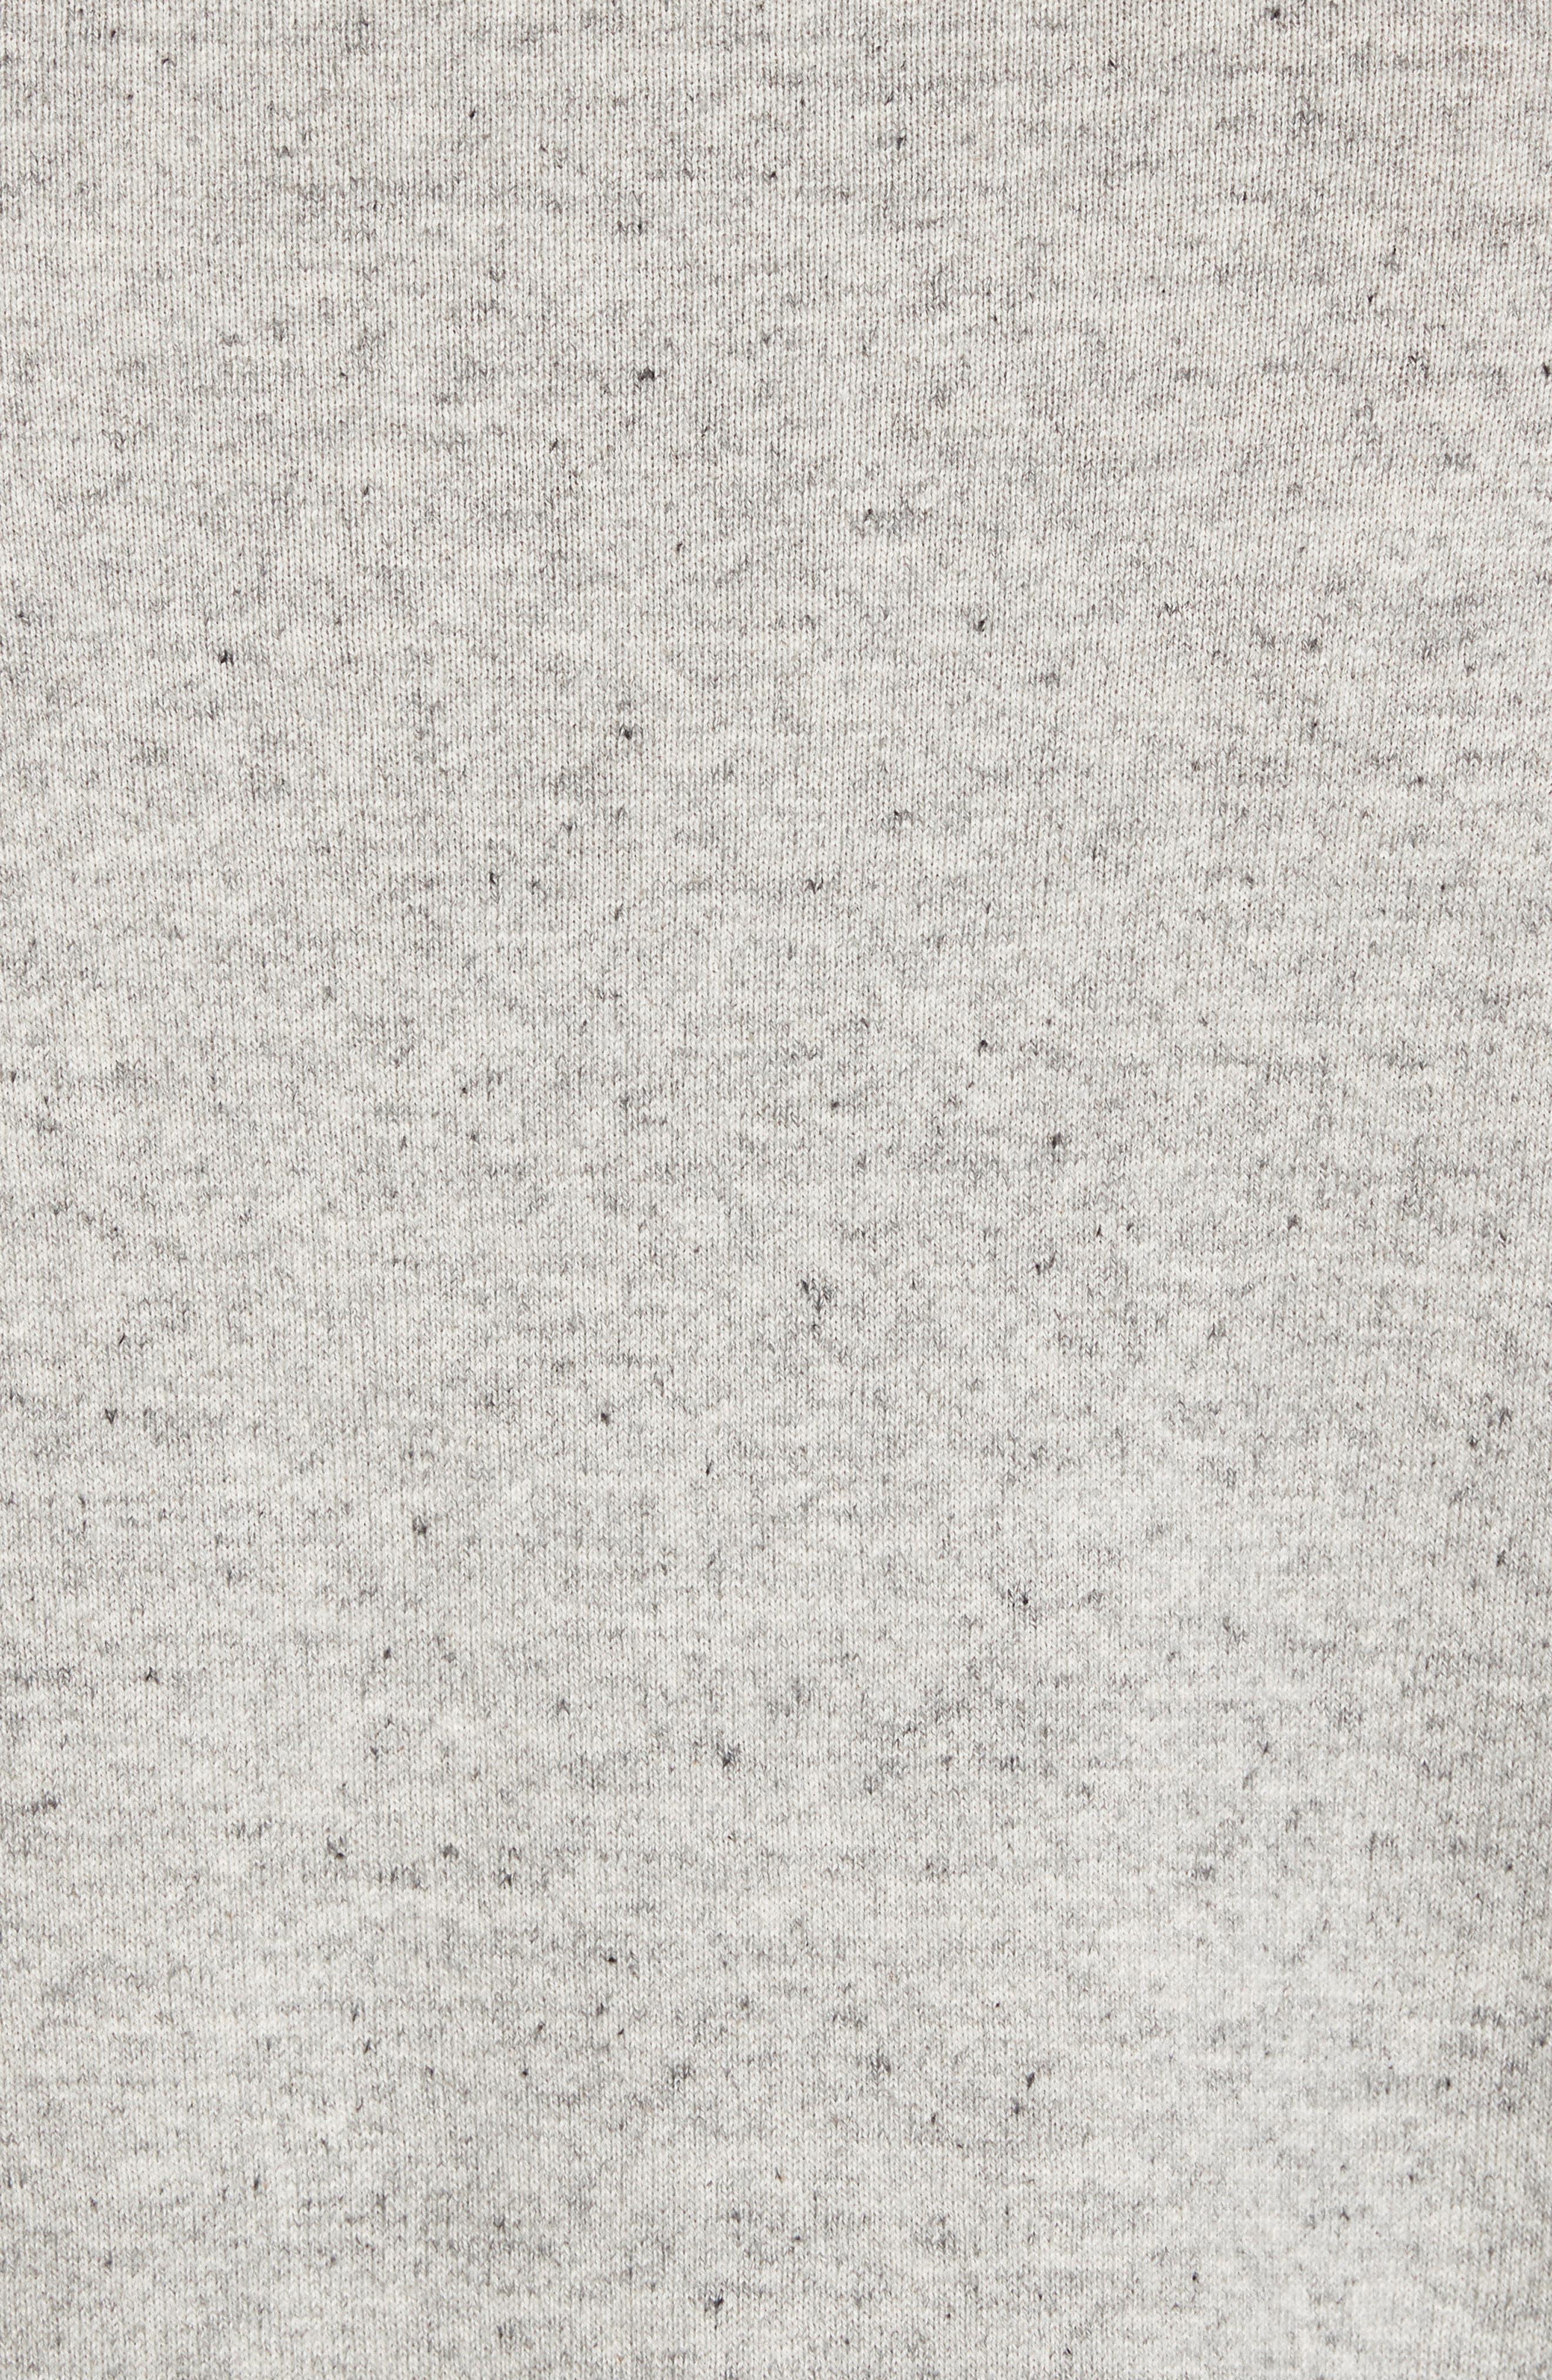 Arbors Cotton V-Neck Sweater,                             Alternate thumbnail 5, color,                             Oatmeal